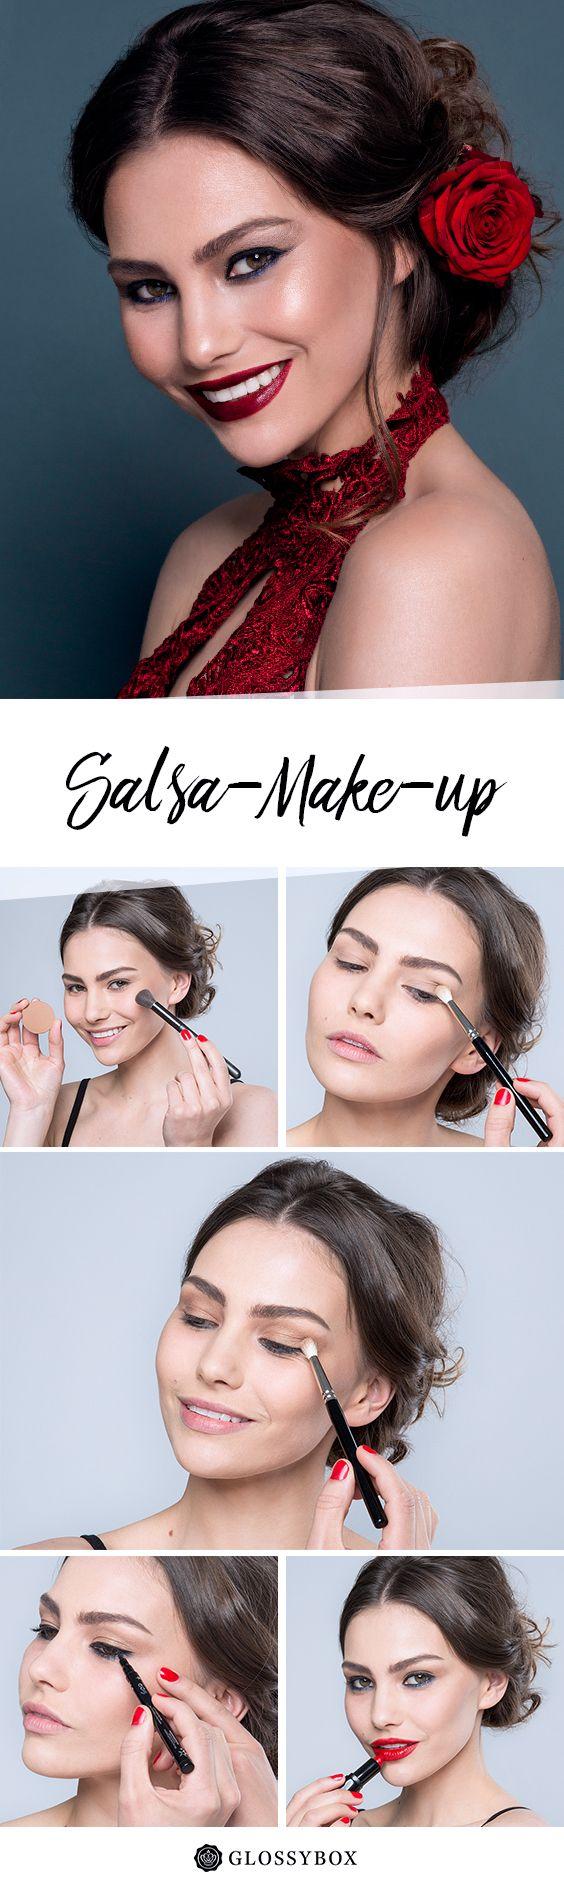 Salsa, Make-up, Red Lip, Tutorial